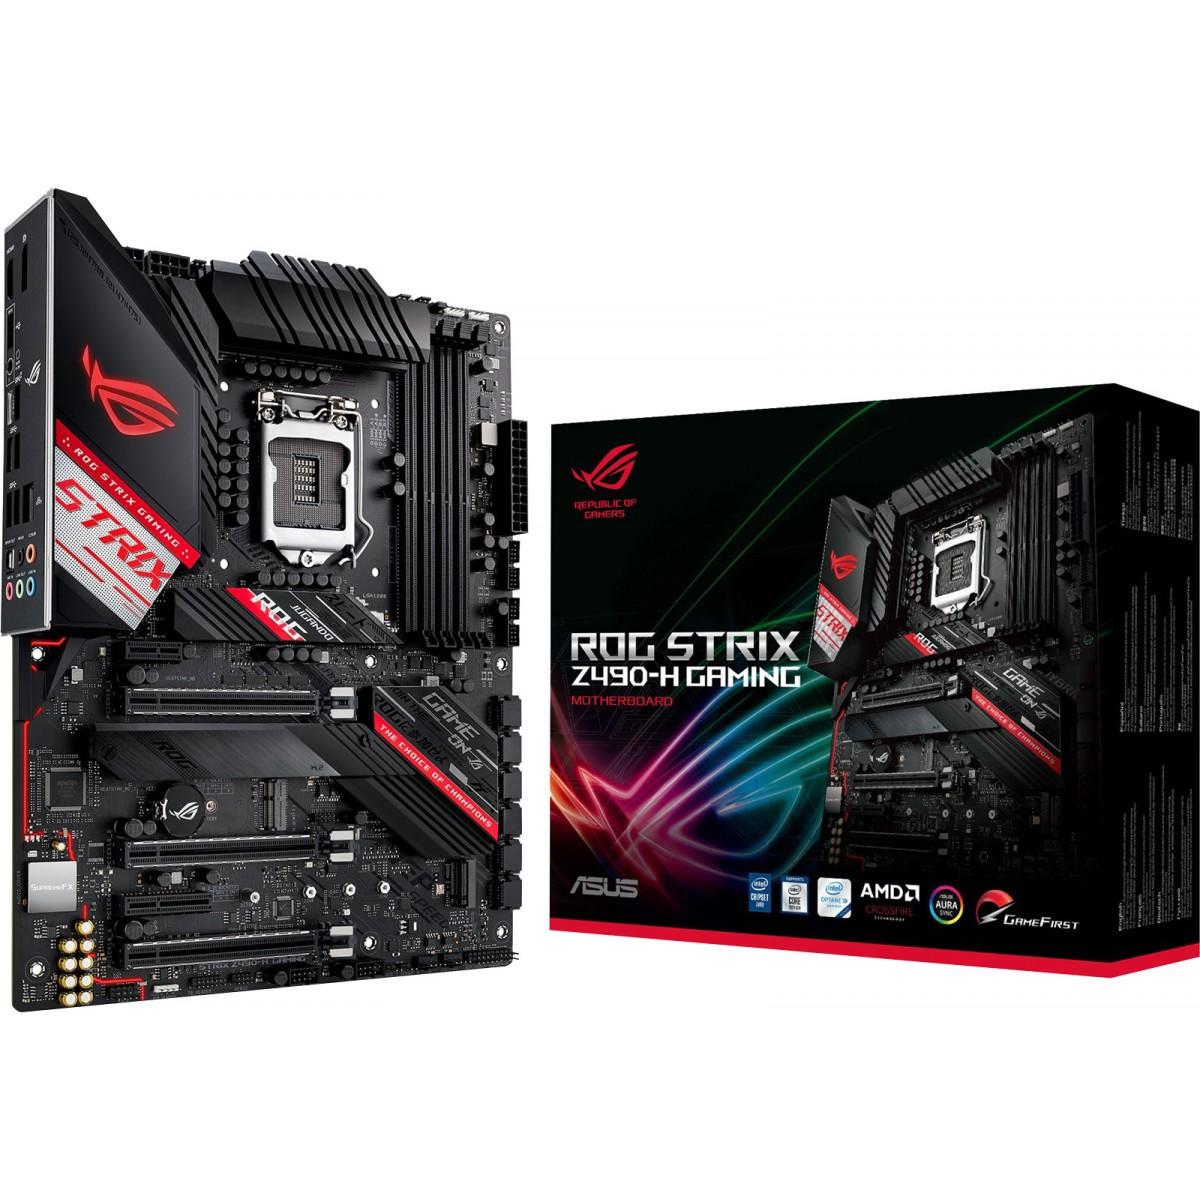 Placa Mãe Asus Rog Strix Z490-H Gaming, Chipset Z490, Intel LGA 1200, ATX, DDR4